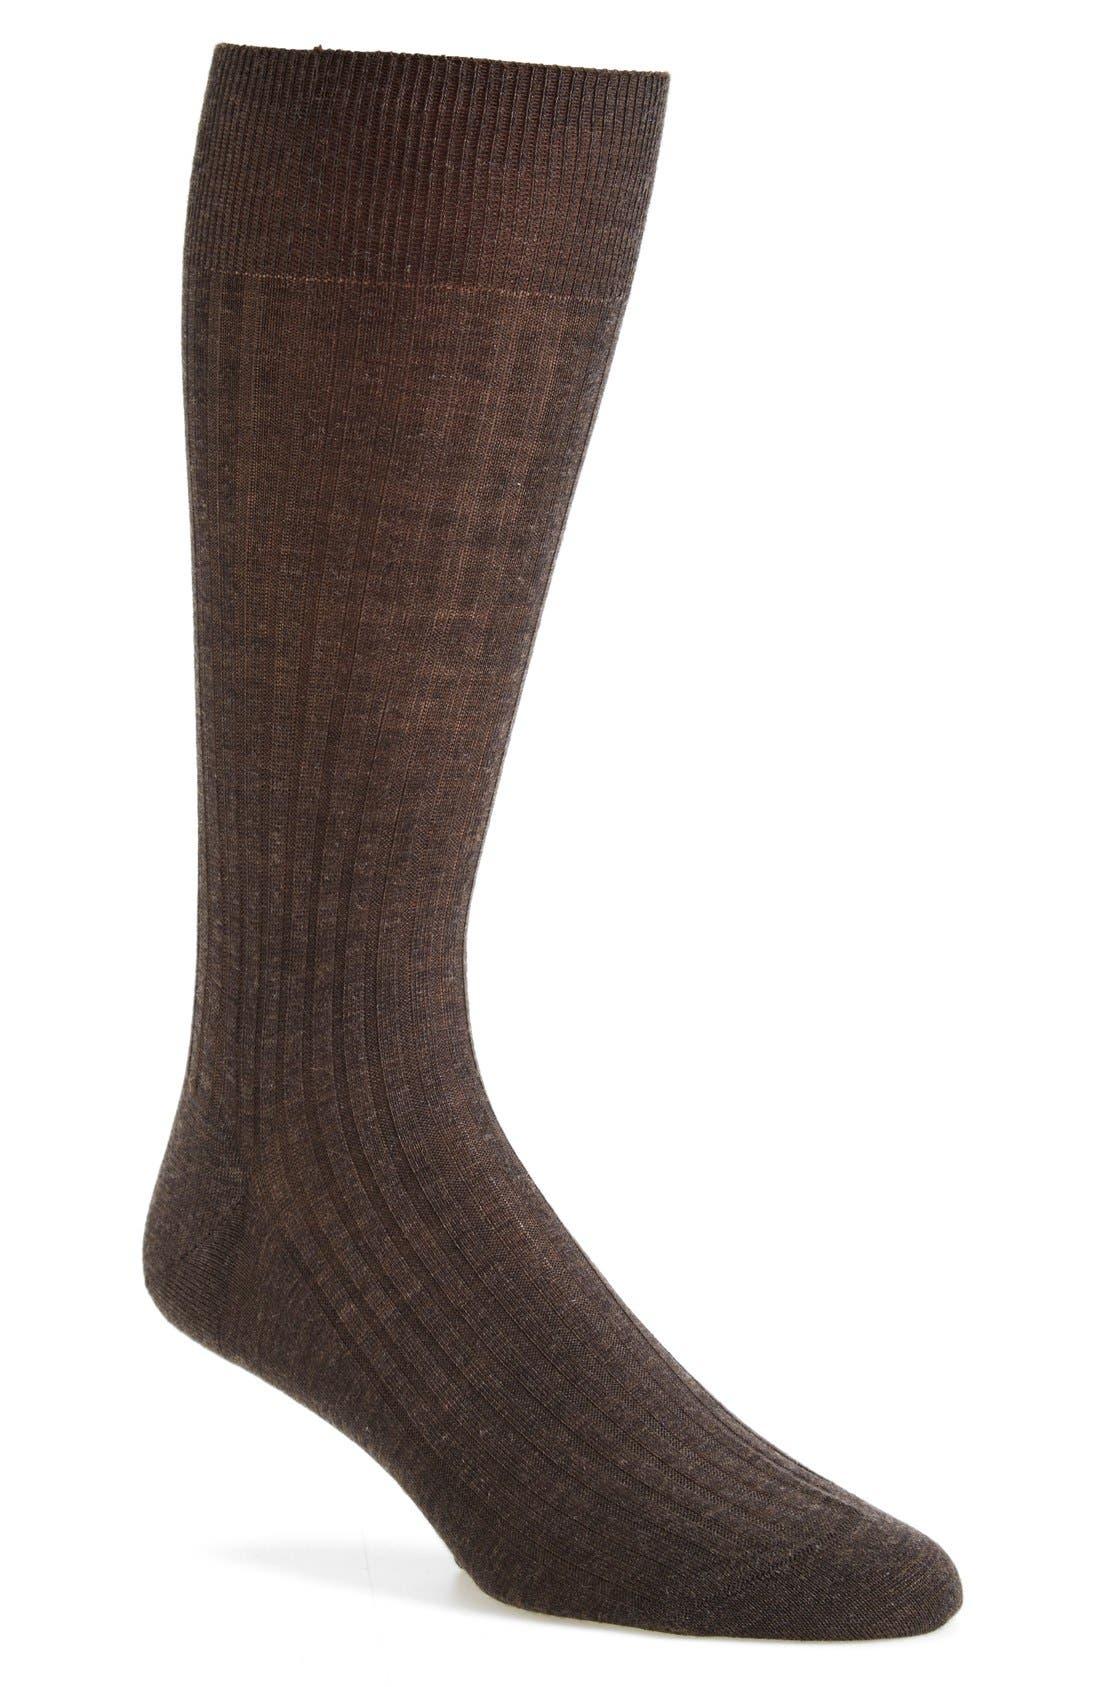 Merino Wool Blend Socks,                             Main thumbnail 1, color,                             DARK BROWN MIX